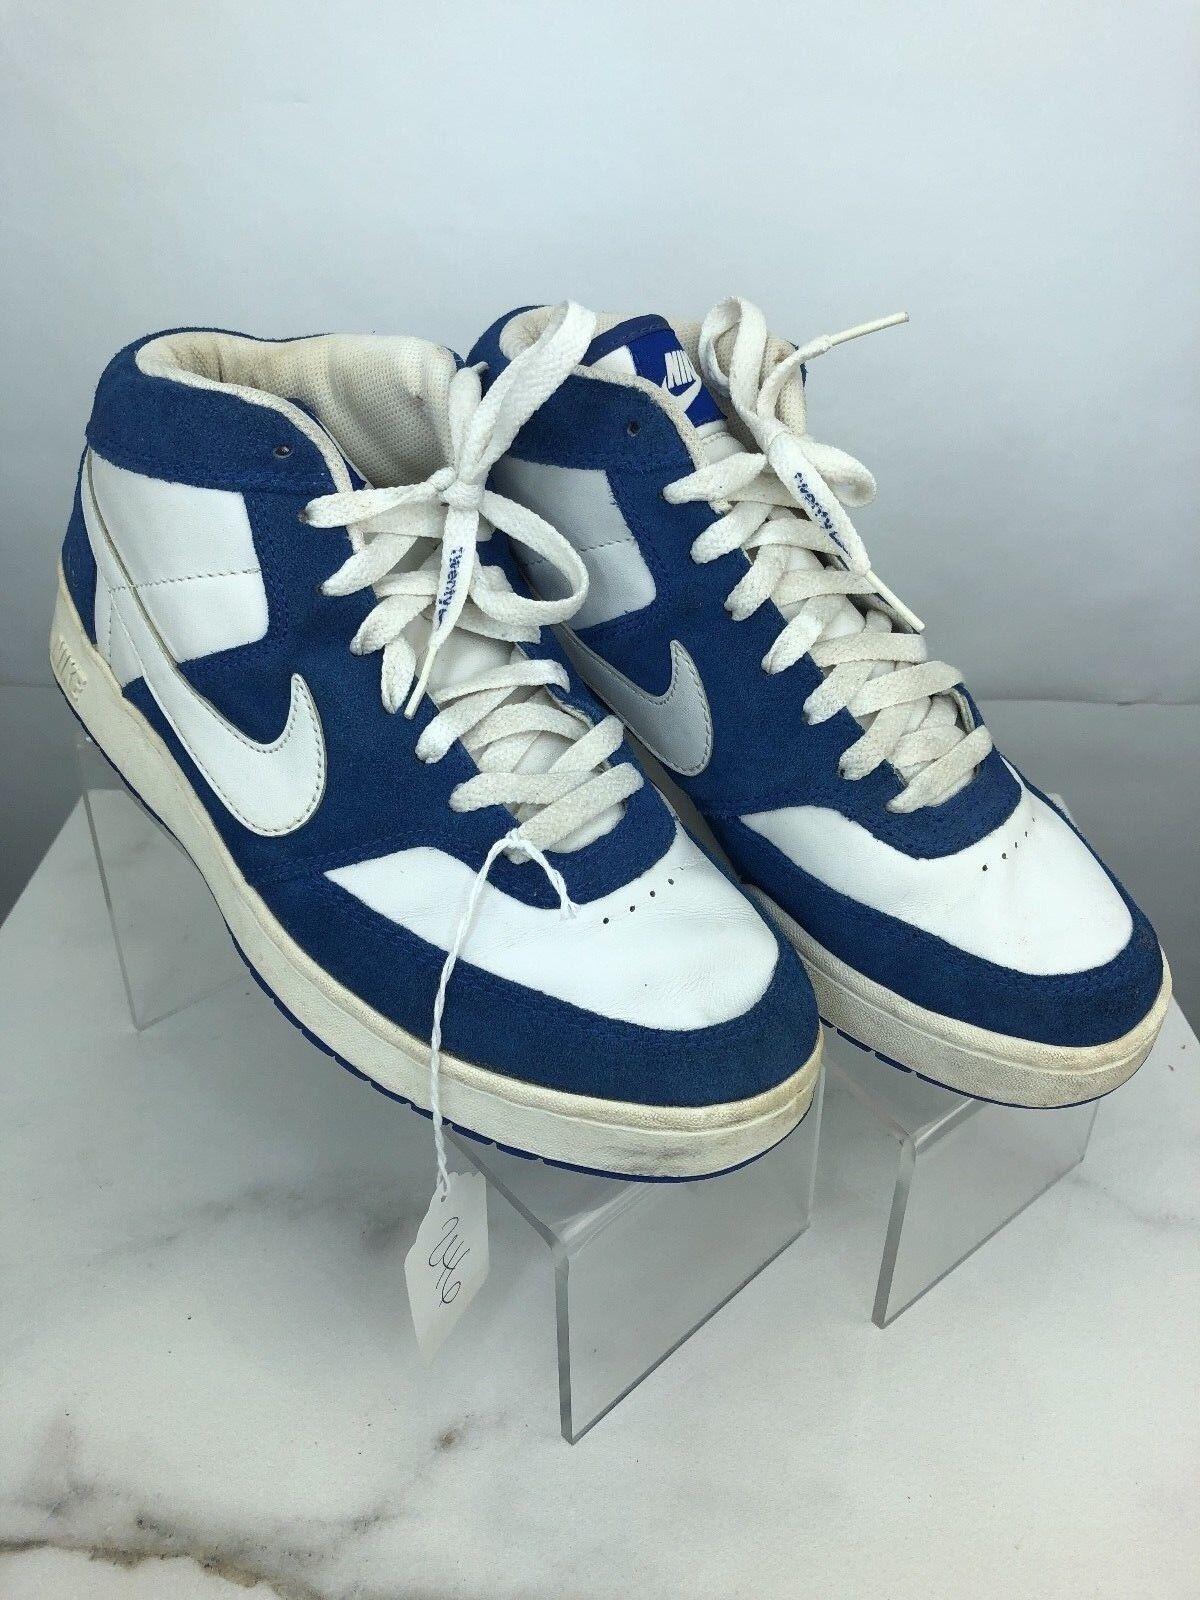 Nike 20 Retro Fleet Center 20 Nike High Top Blue/White Leather 308443 Size 8 () 9c711e